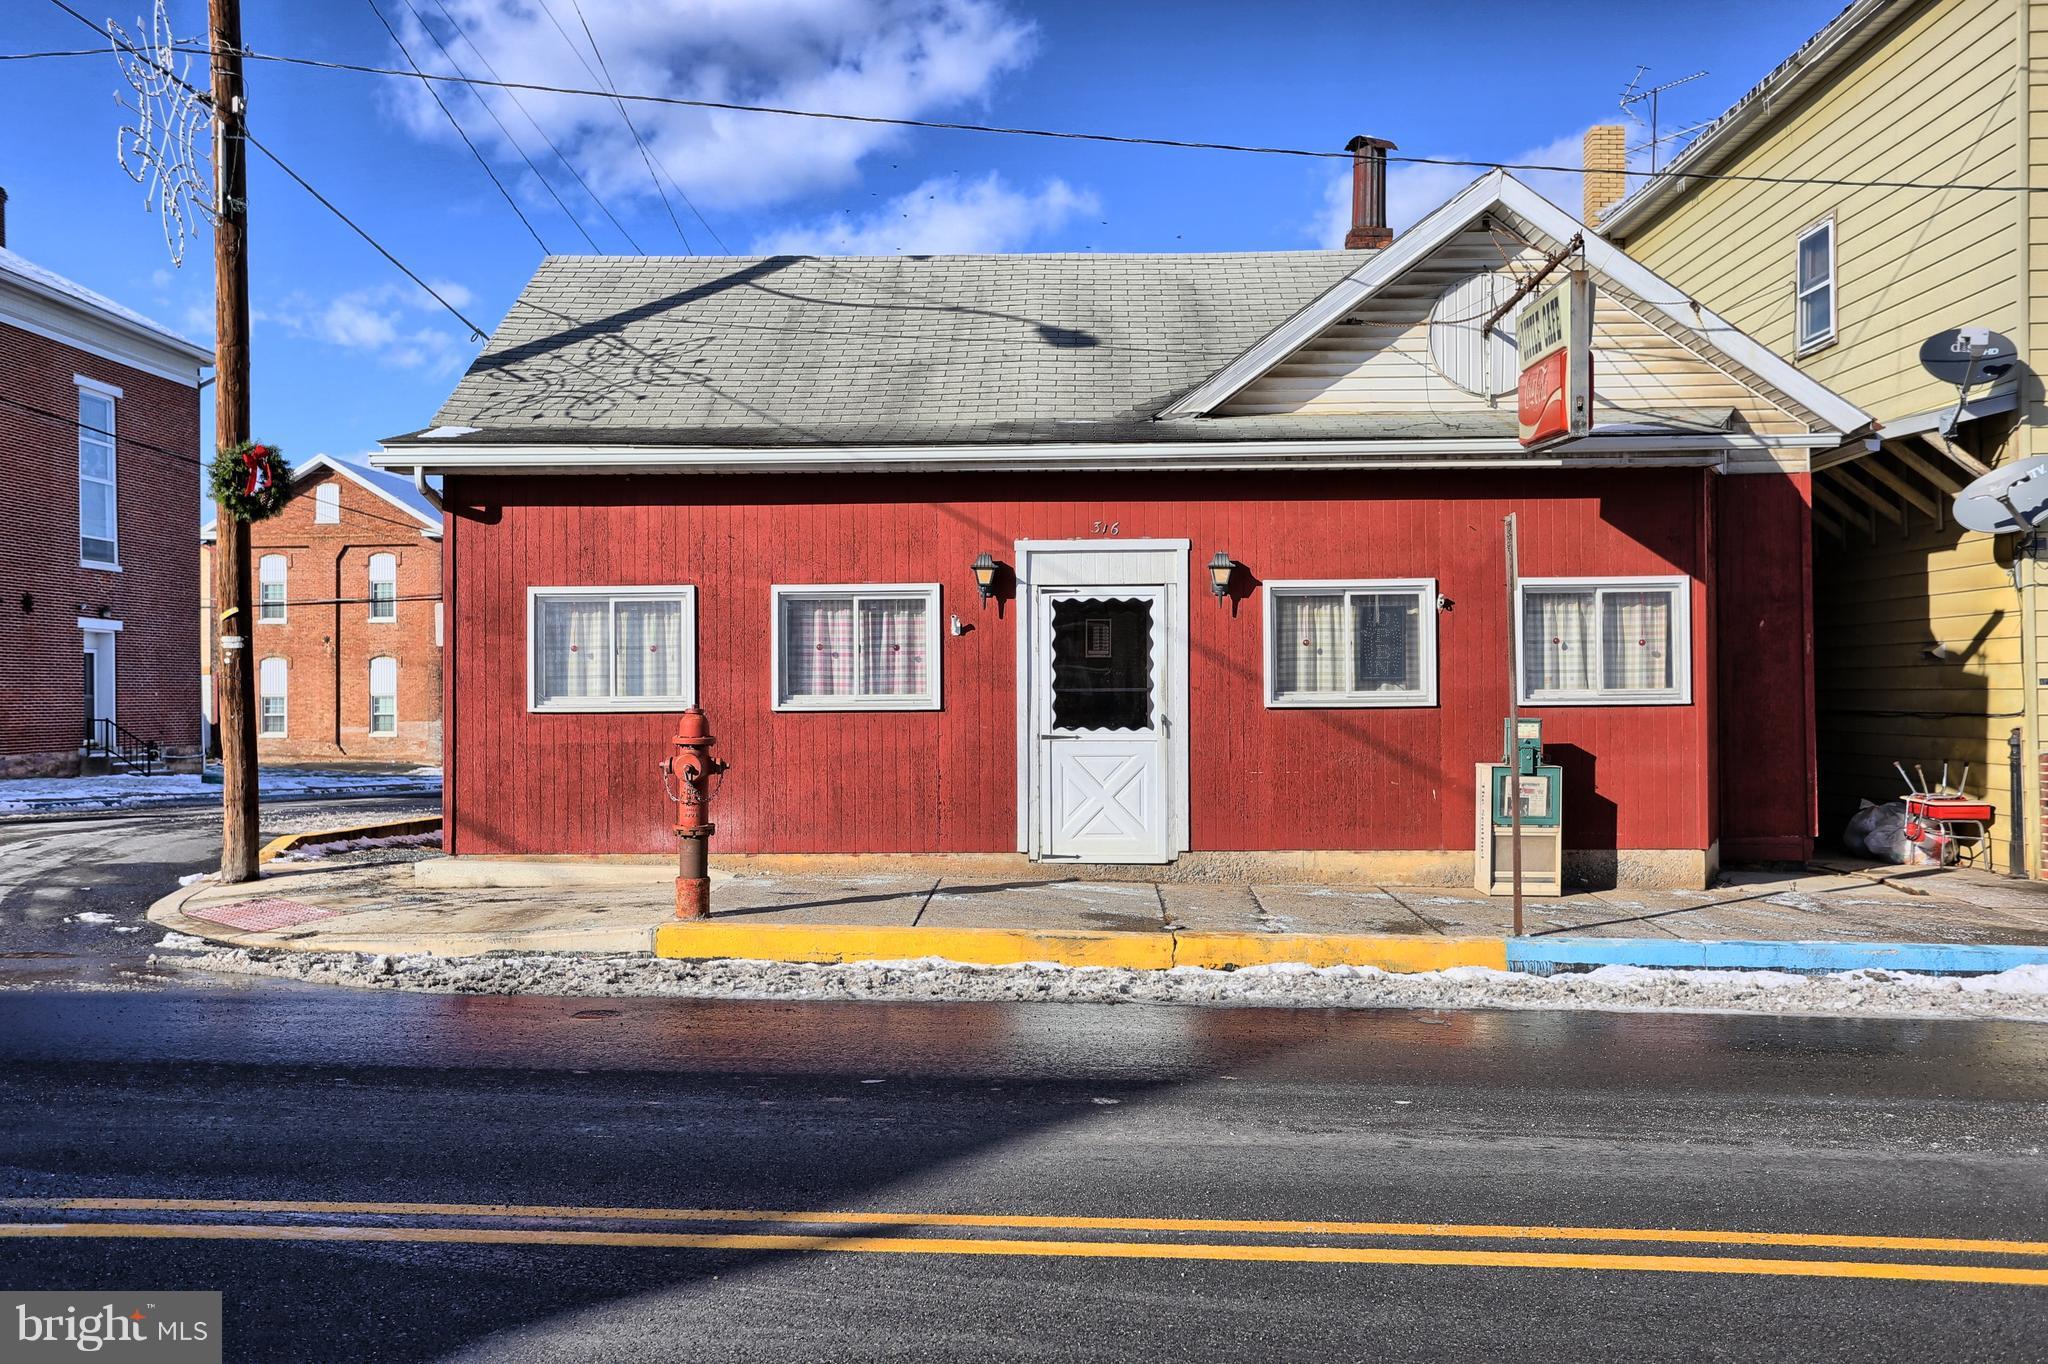 316 MARKET STREET, PORT ROYAL, PA 17082